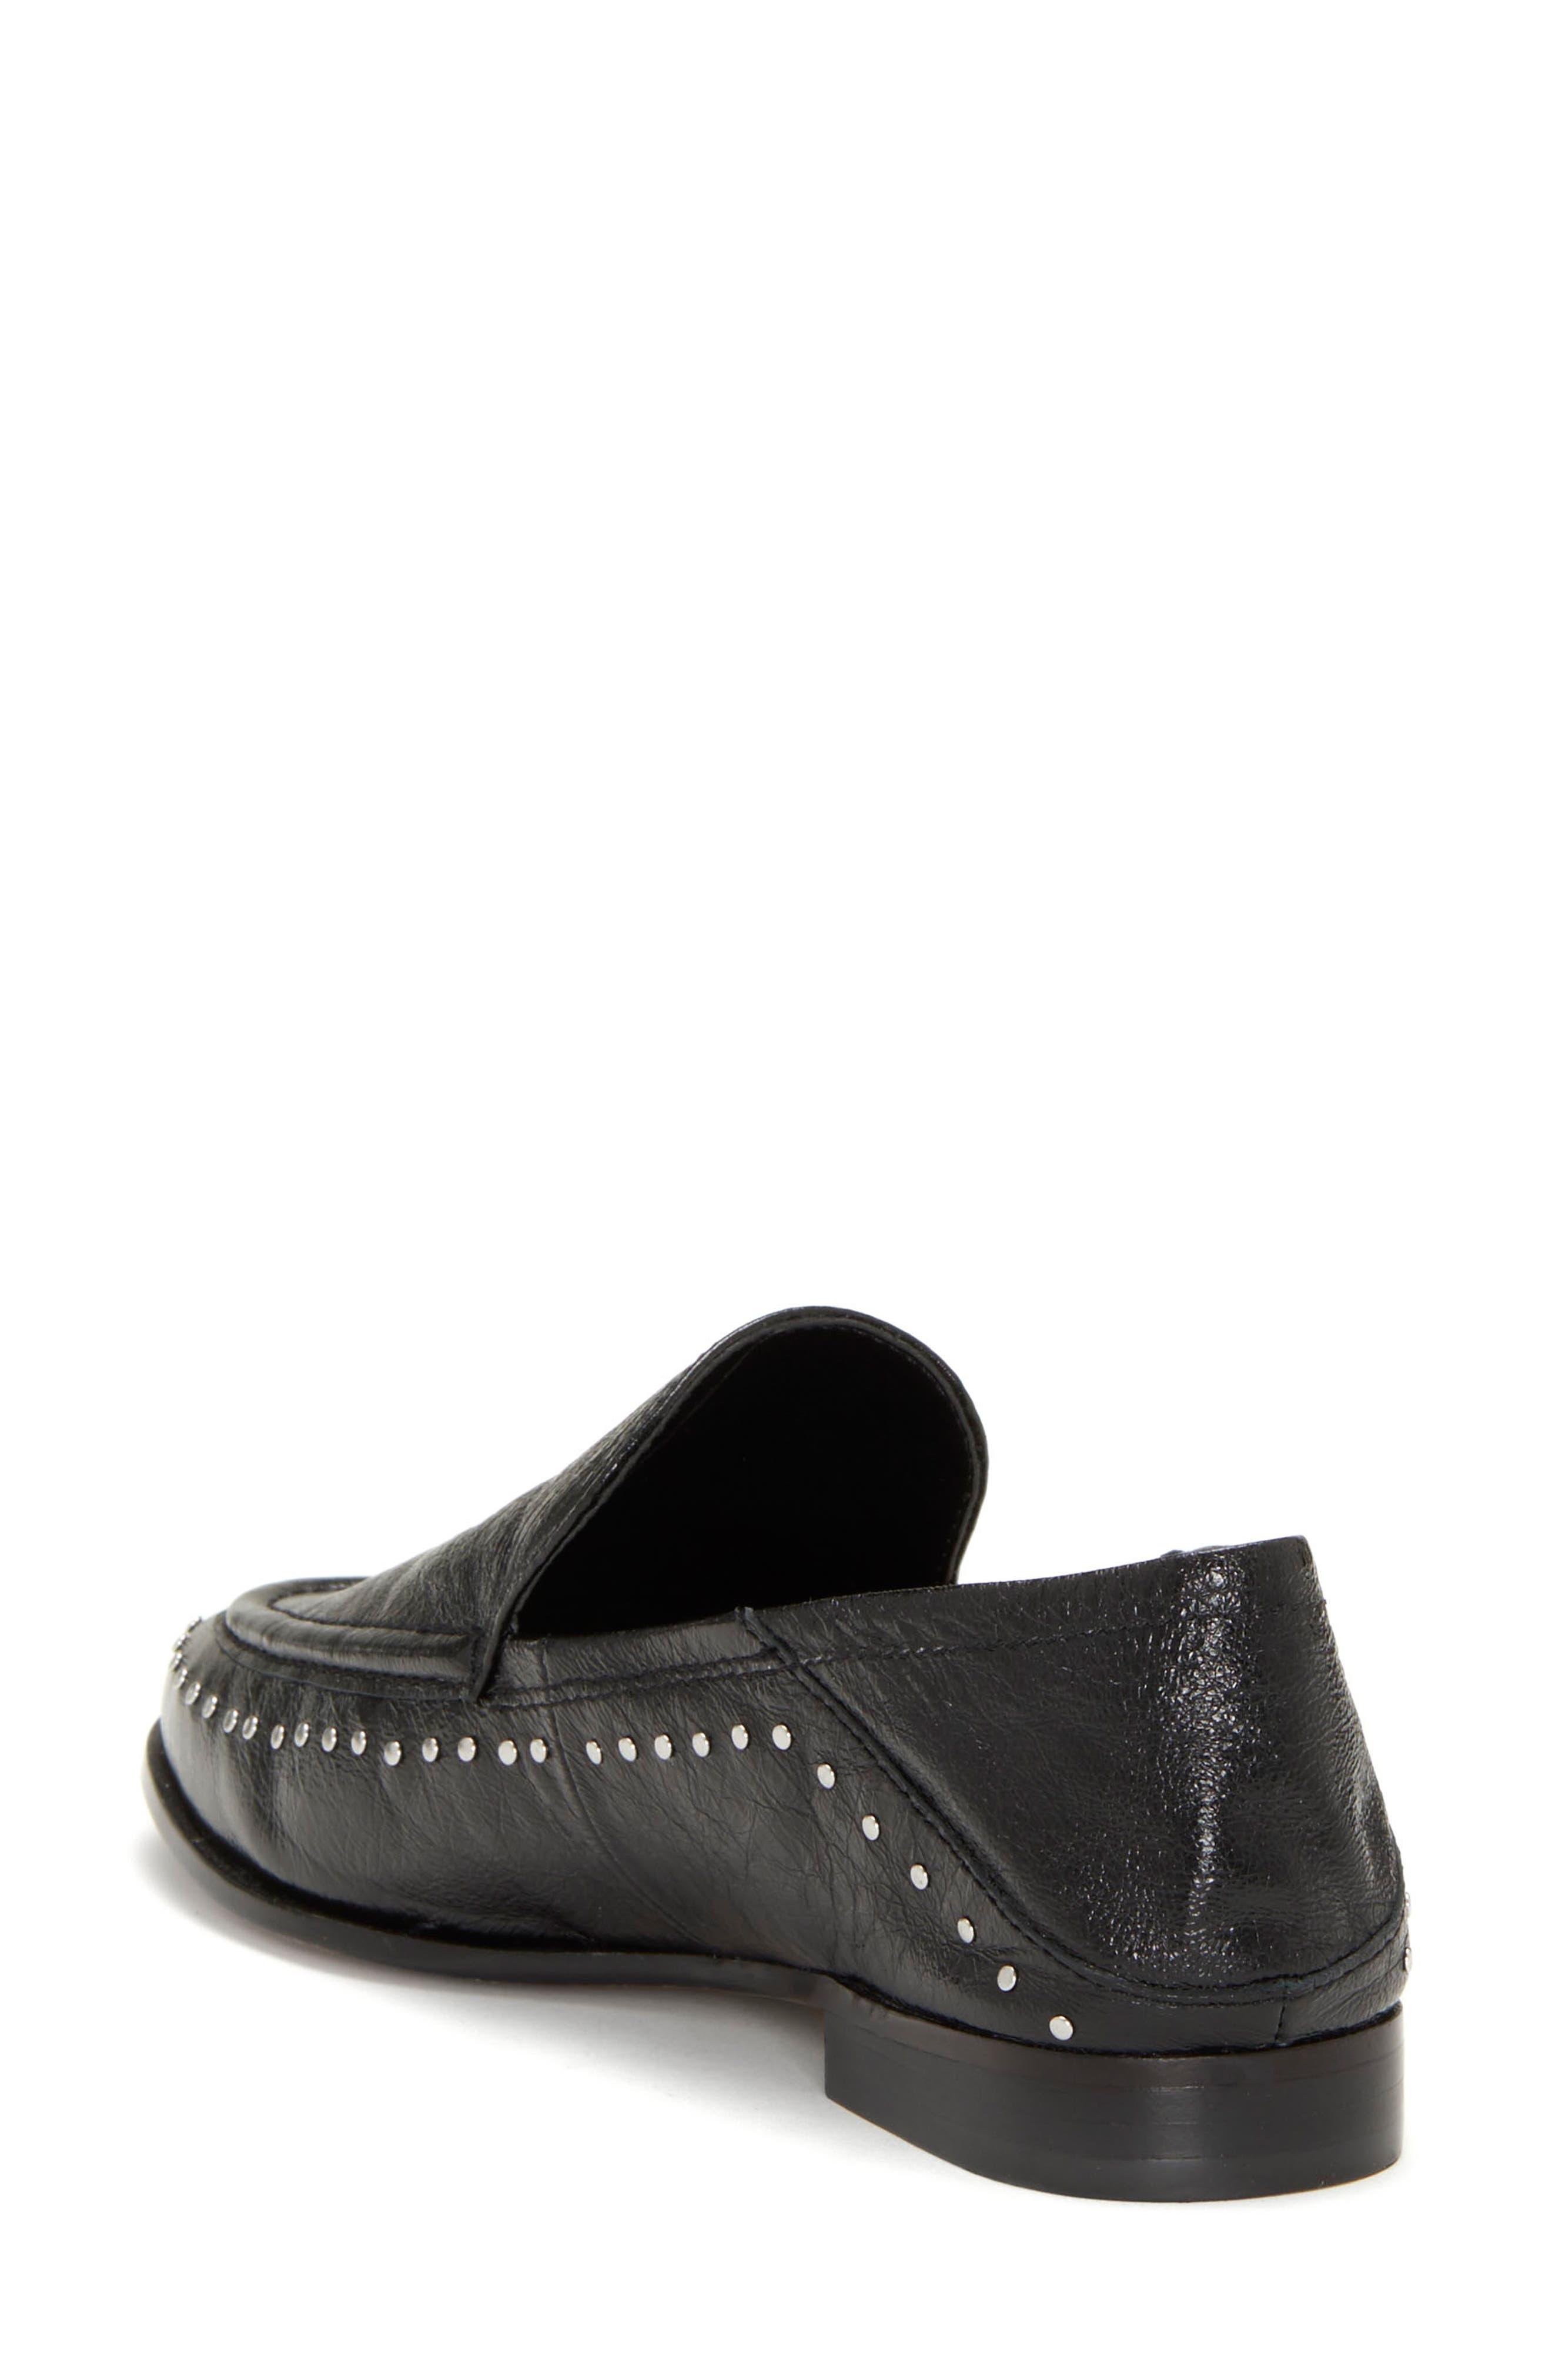 Jendeya Convertible Studded Loafer,                             Alternate thumbnail 3, color,                             001